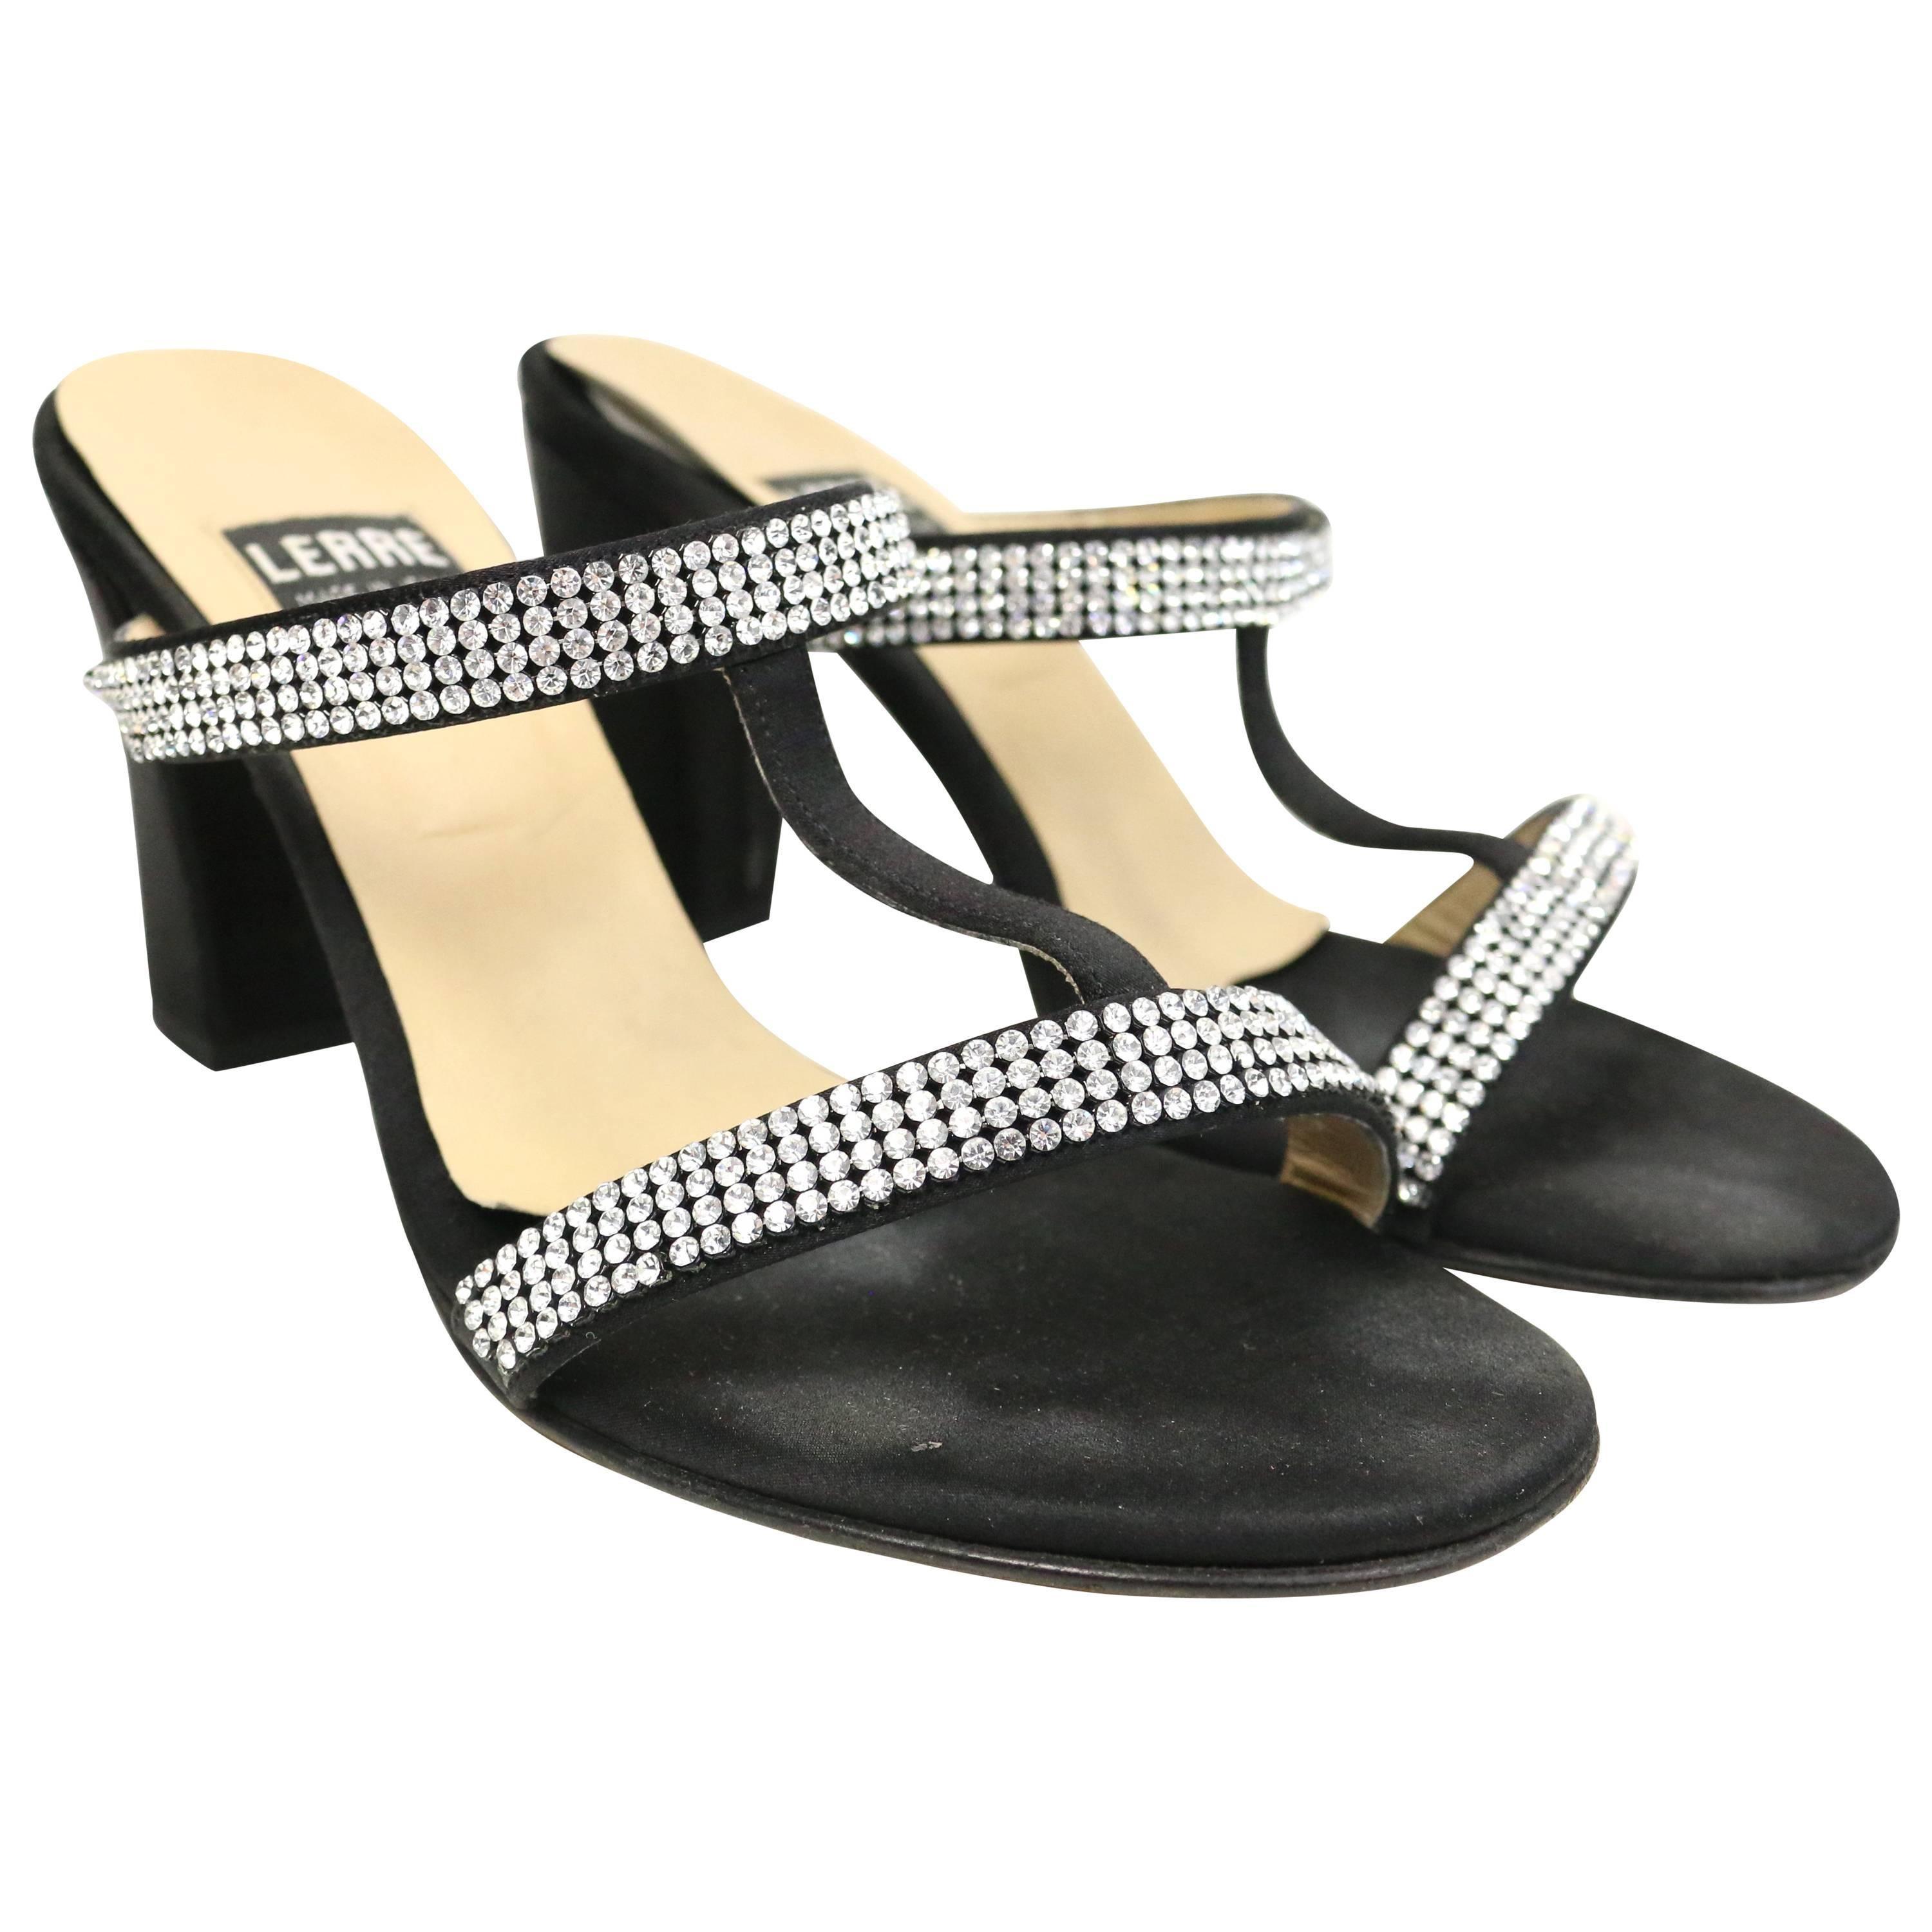 LERRE Black with Silver Rhinestones Strap Open Toe Sandals Heels